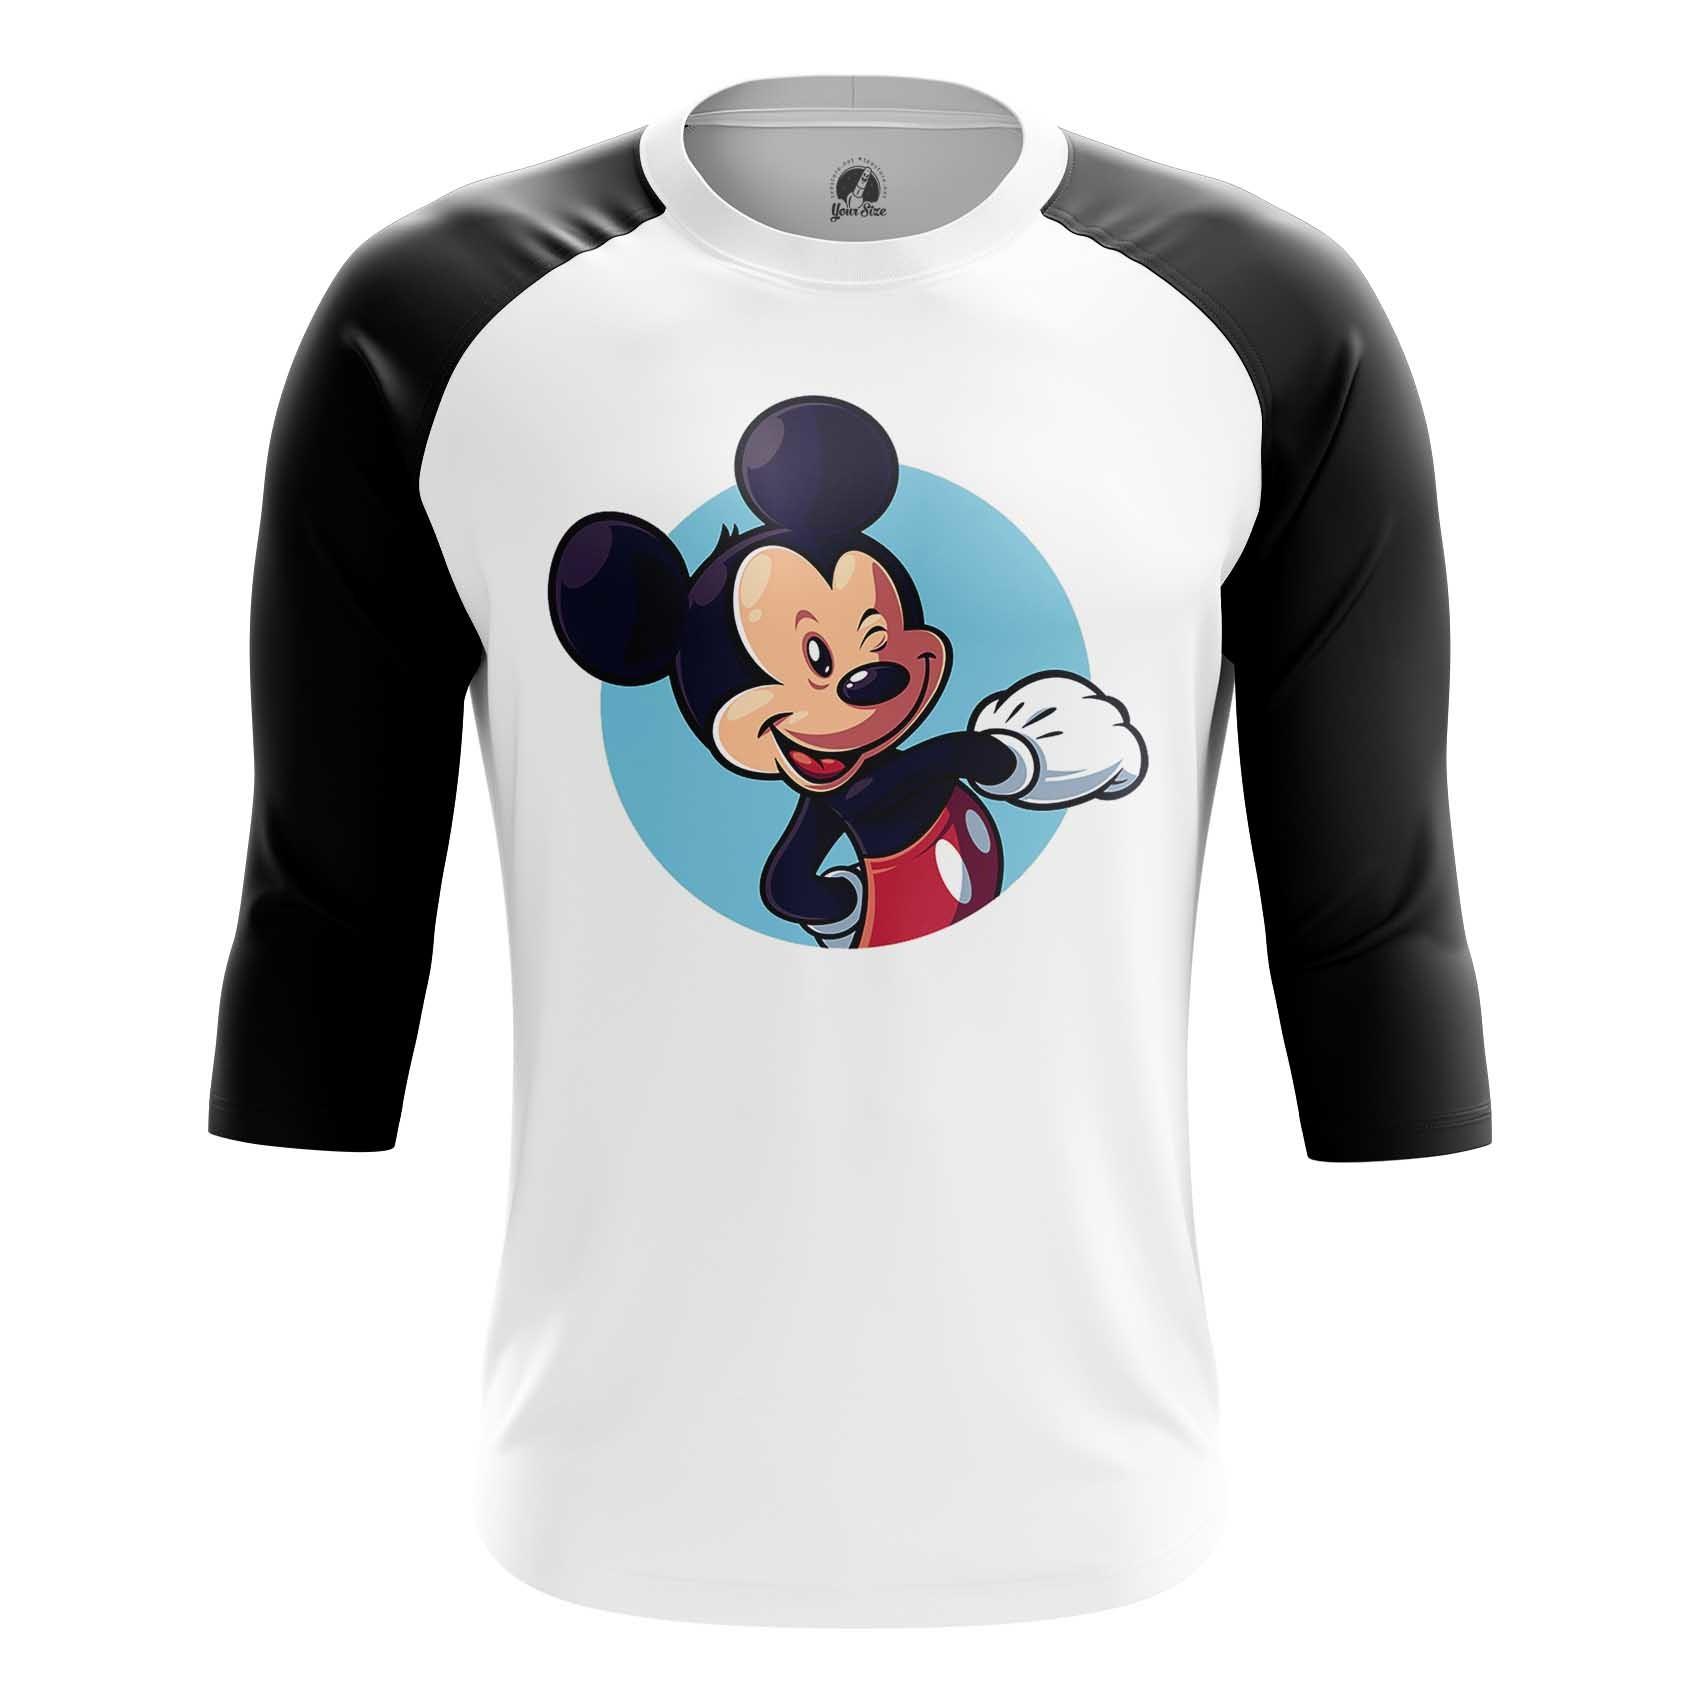 Merch Men'S T-Shirt Mickey Mouse Disney Art